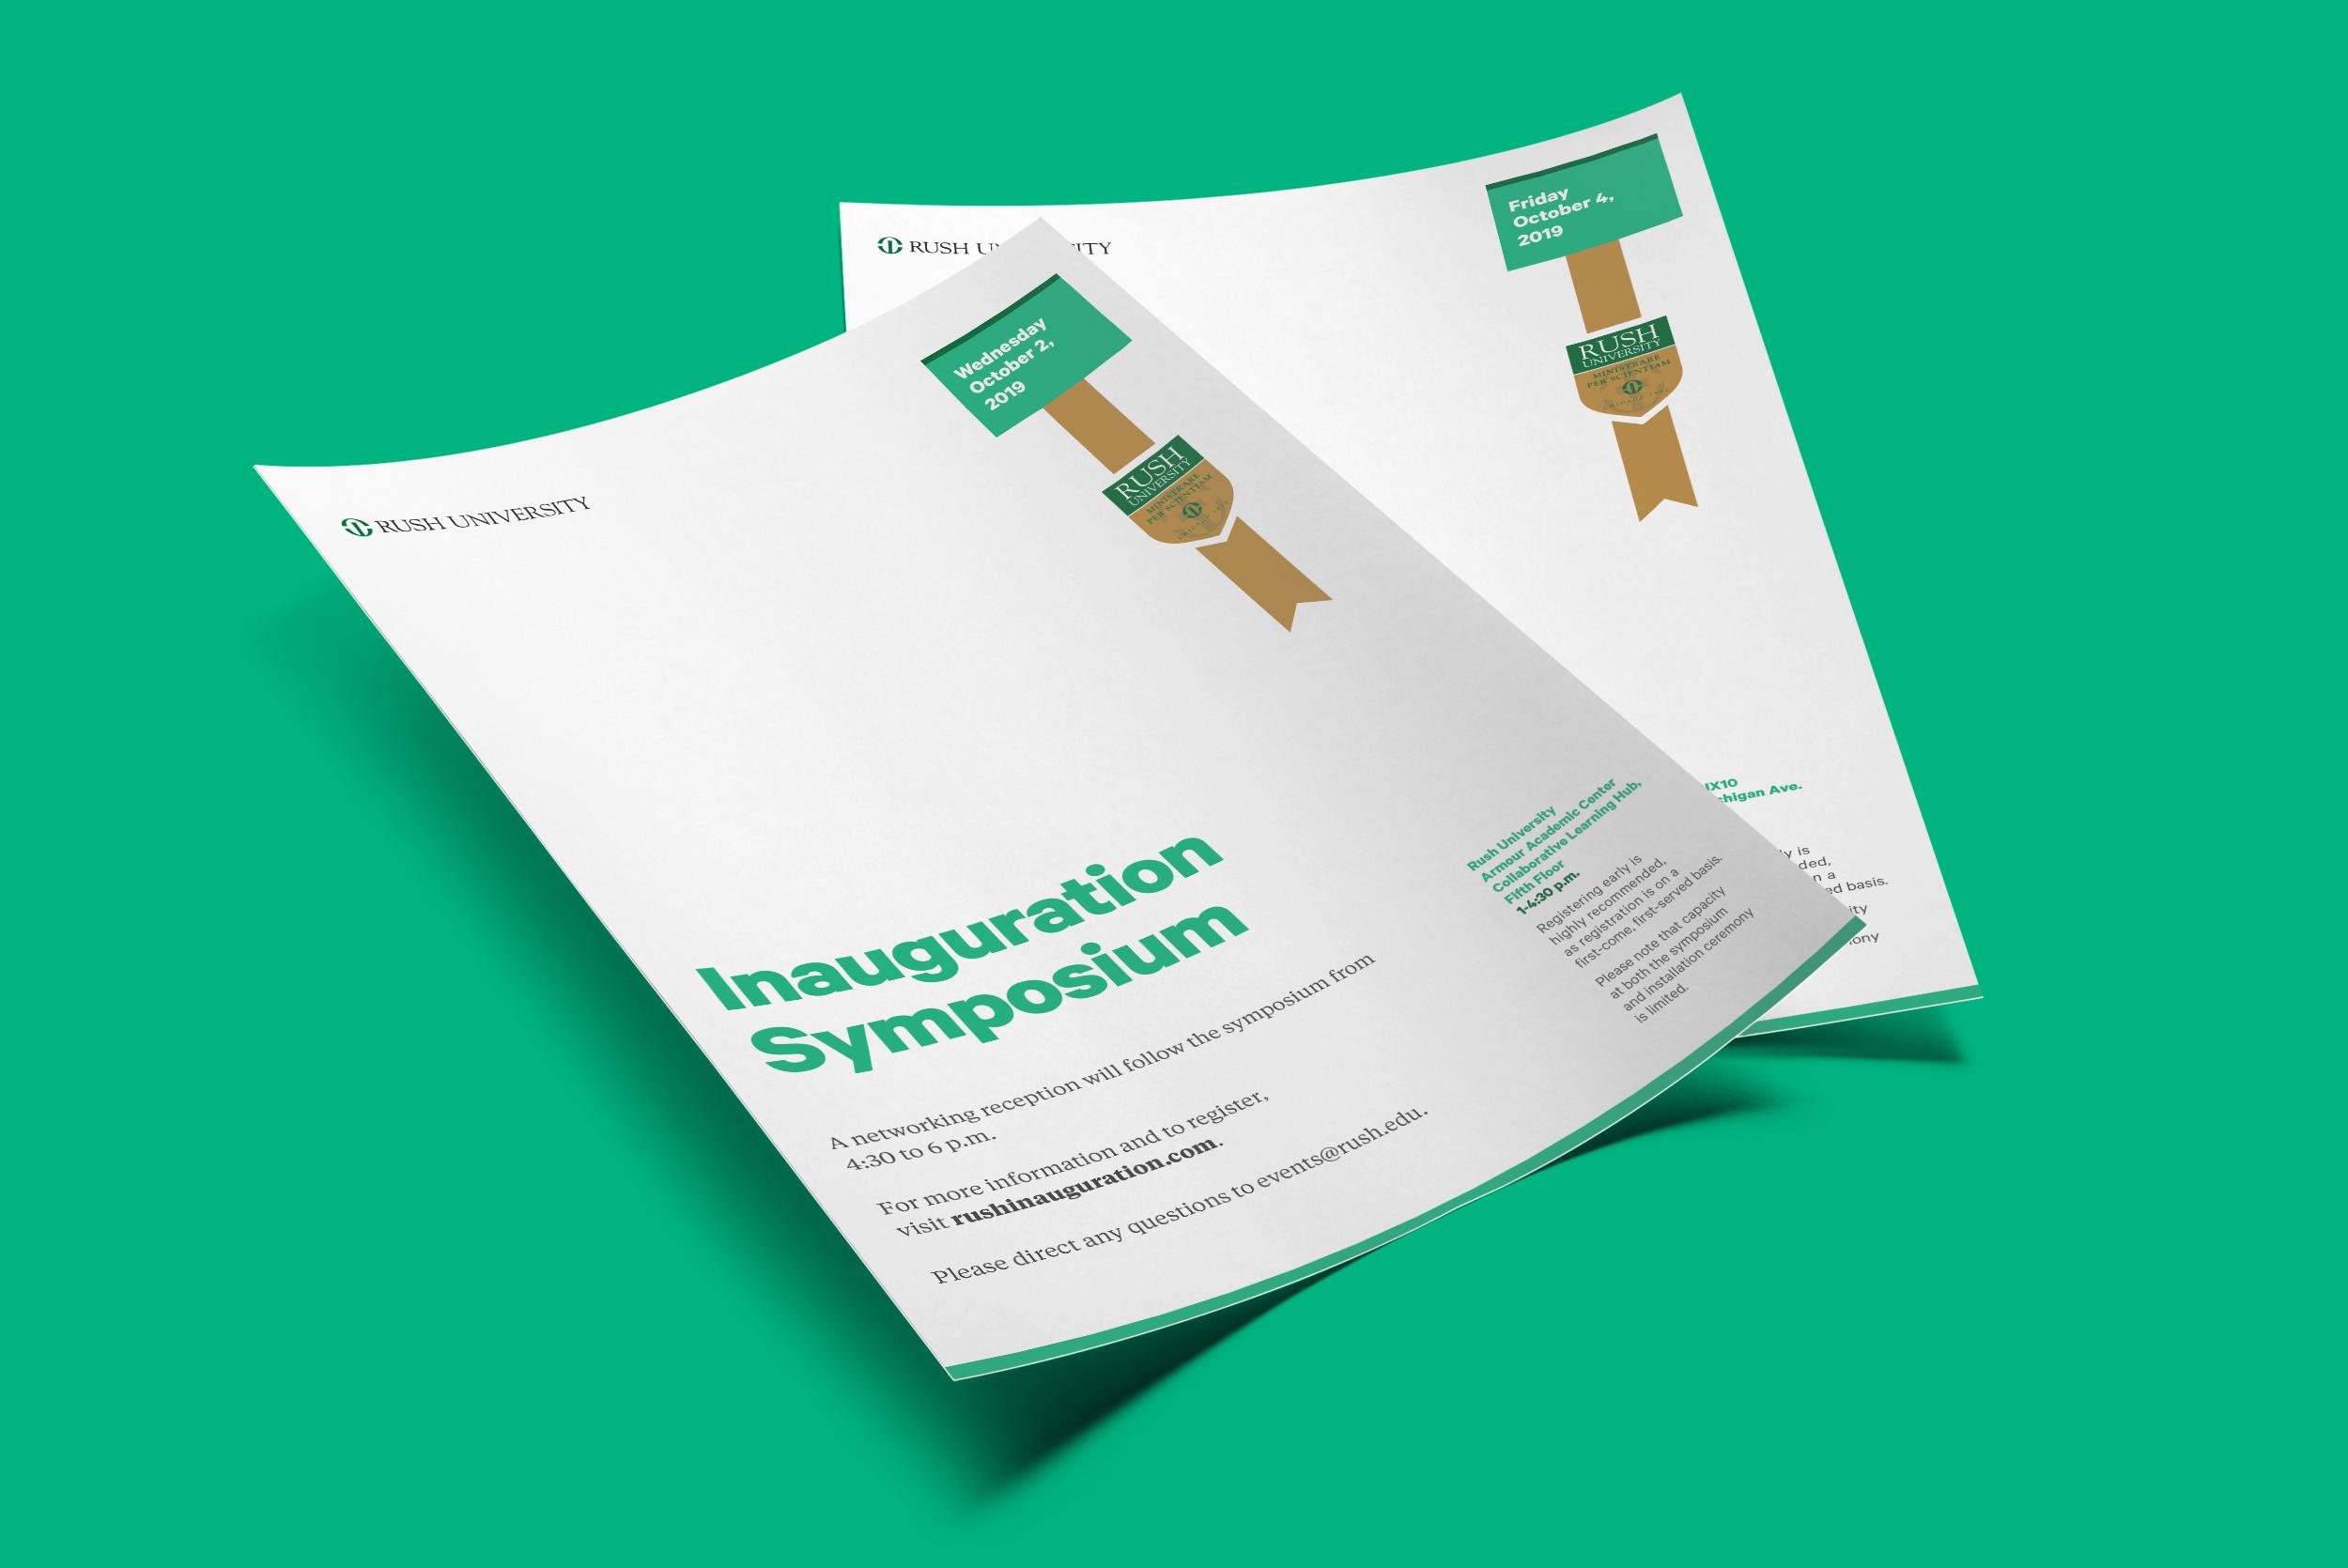 Inauguration-Flyer-free-mockup-by-mockupcloud